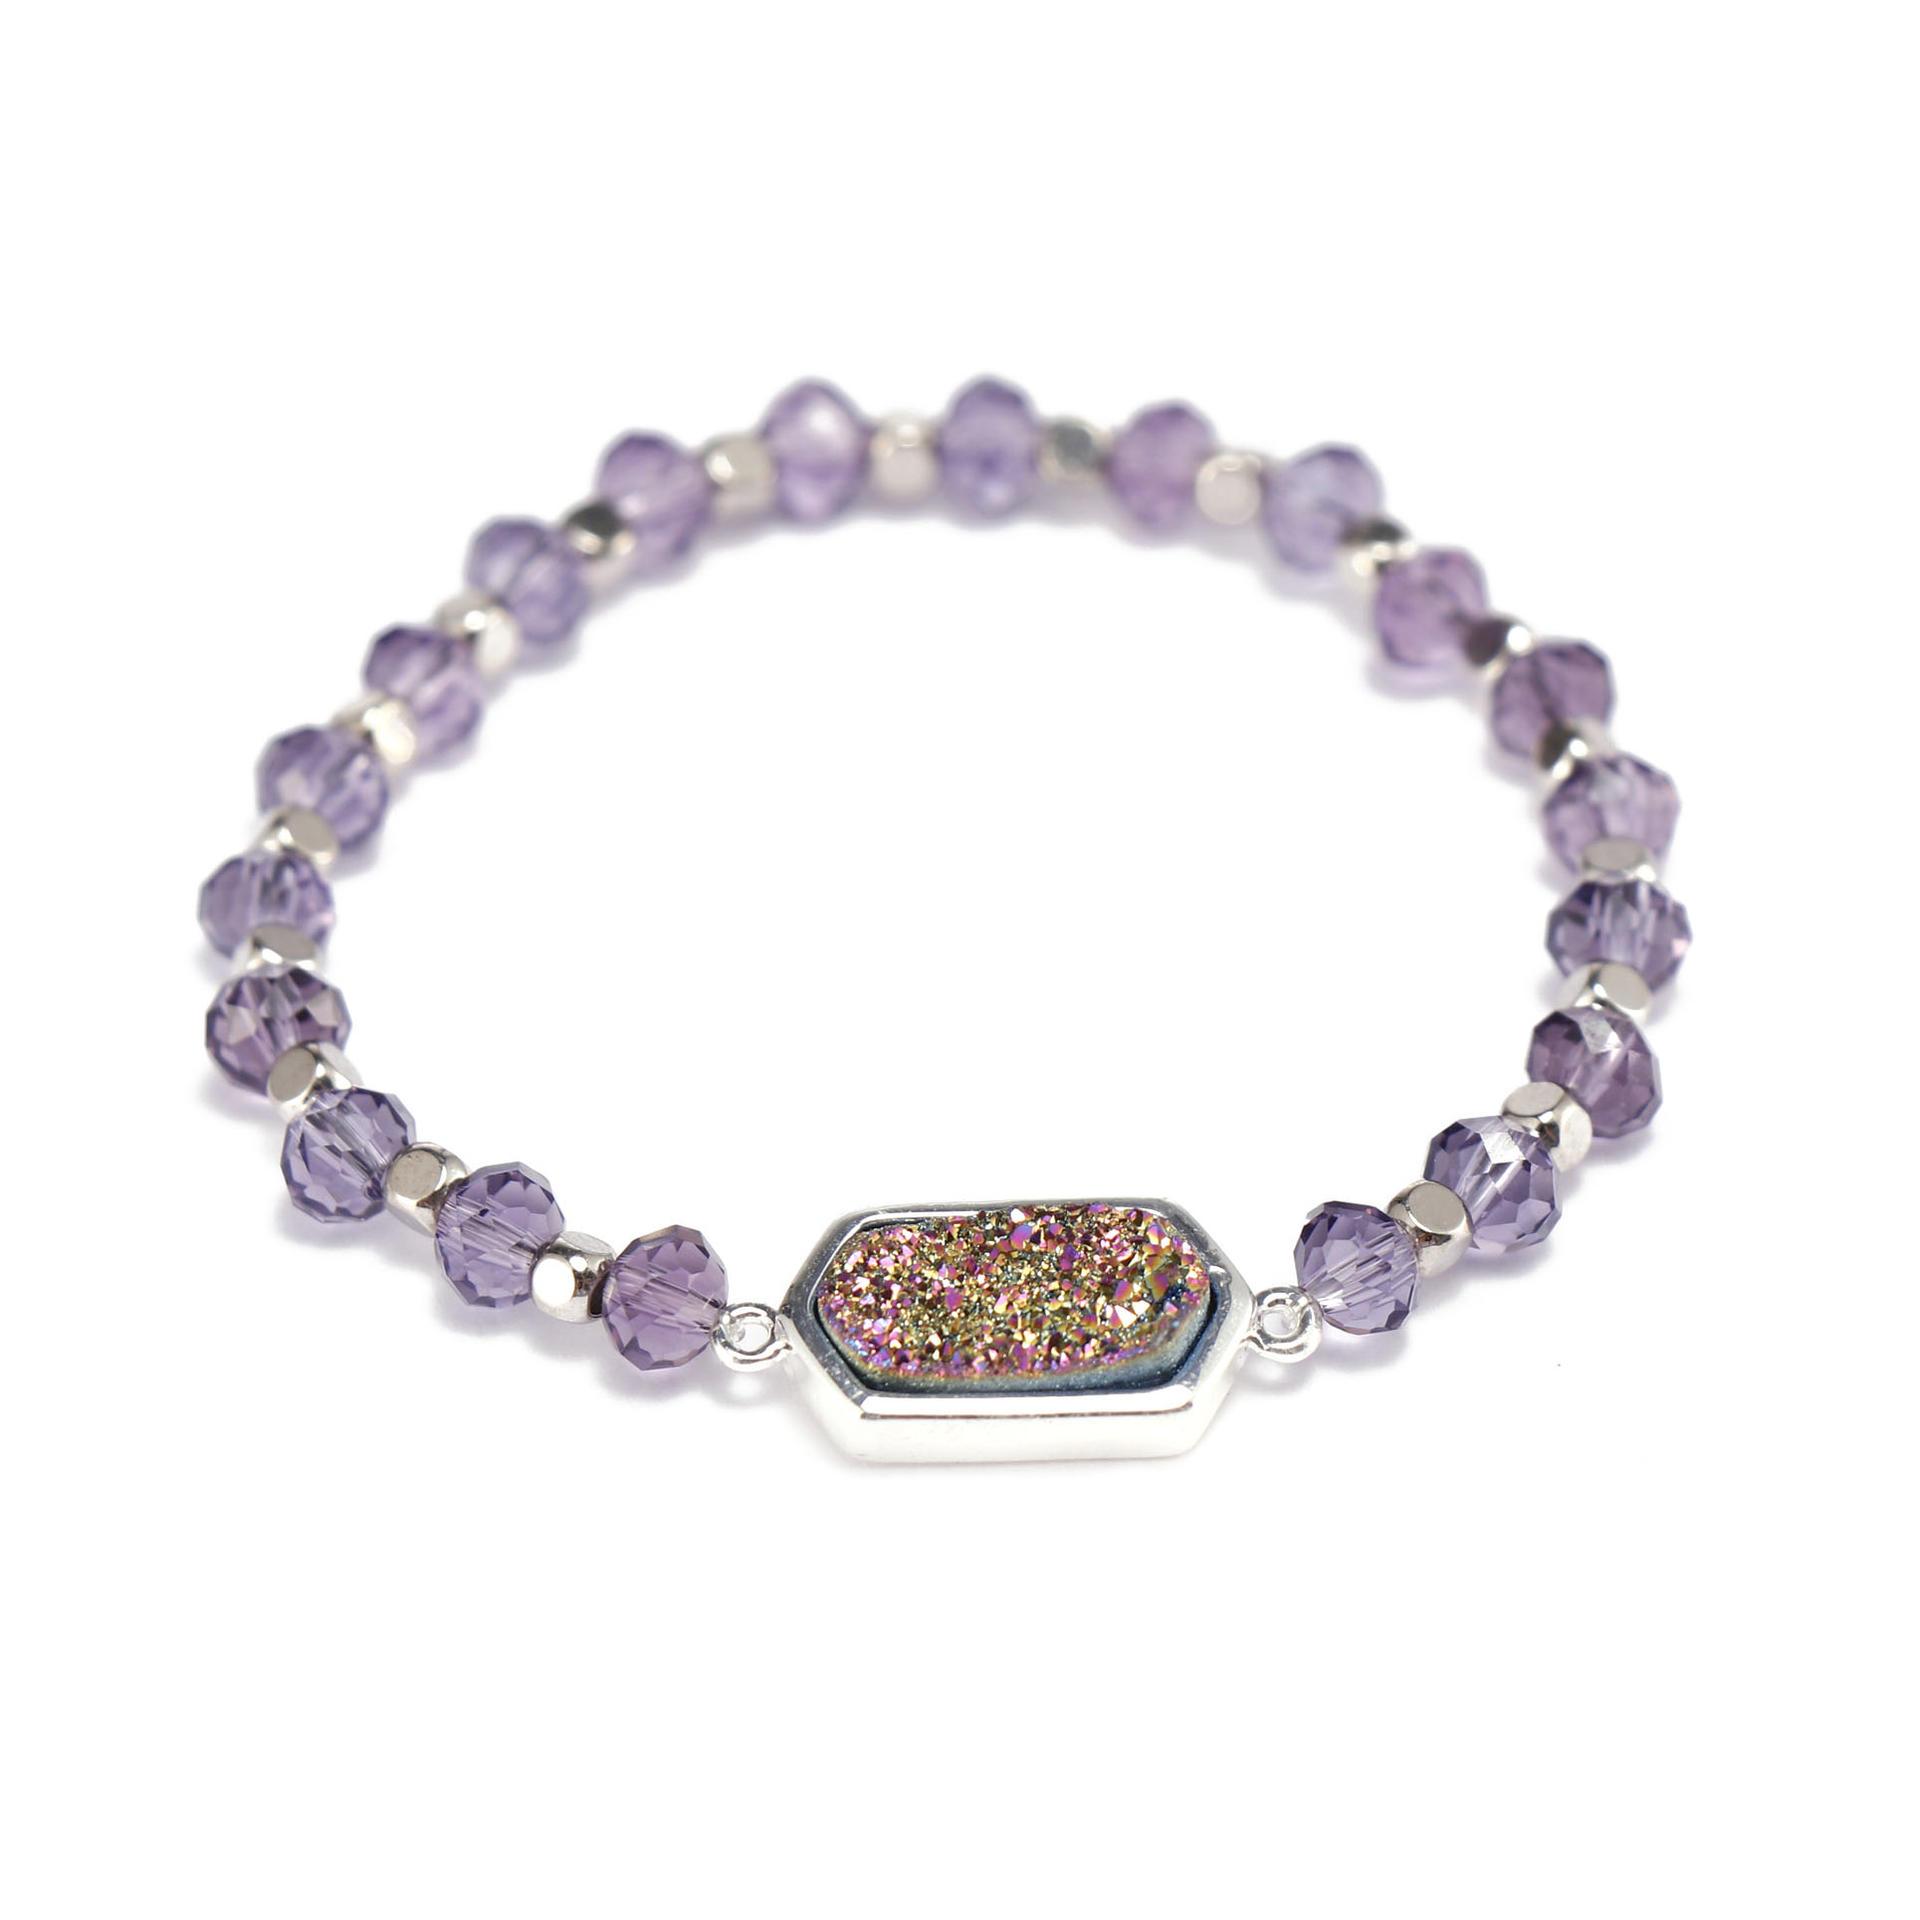 TTT Jewelry Brand  manufacture